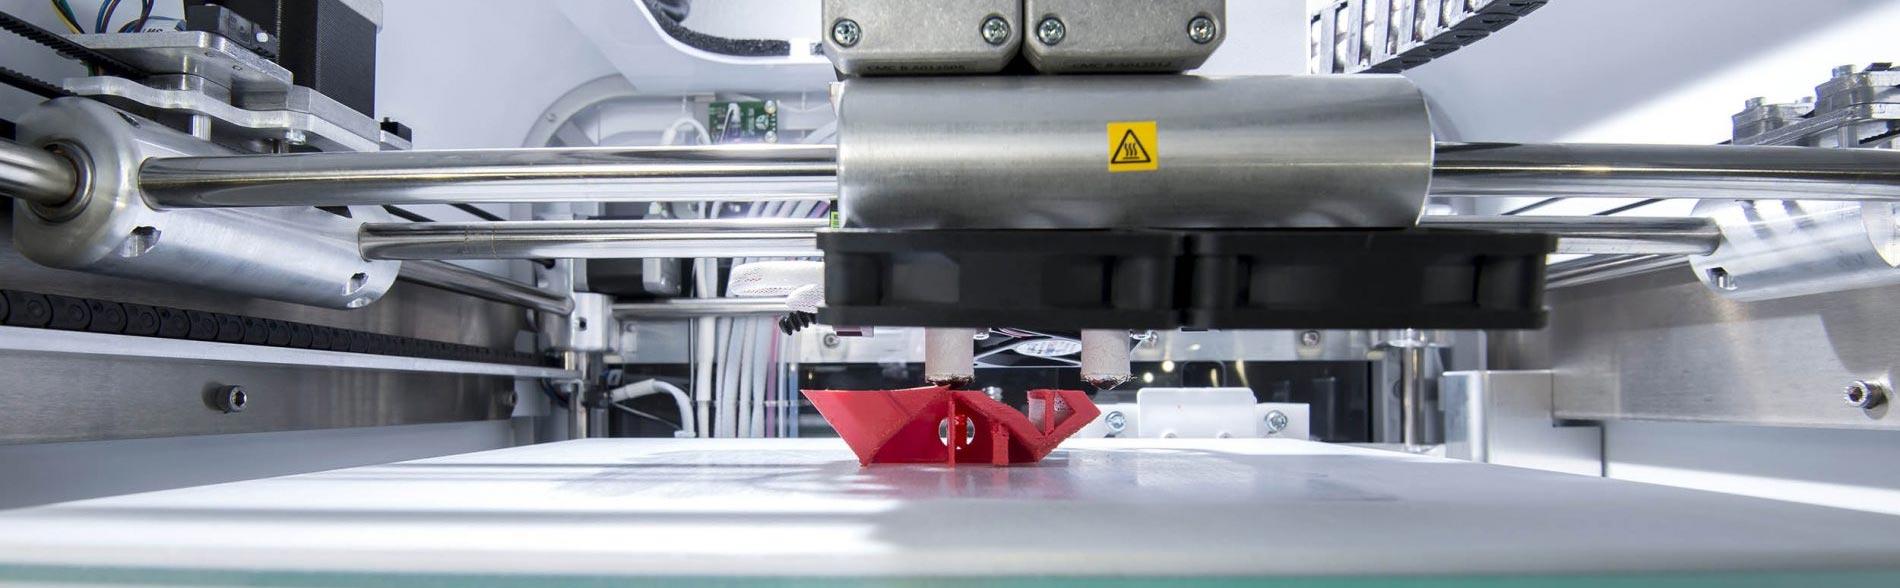 Impresora 3D Industrial